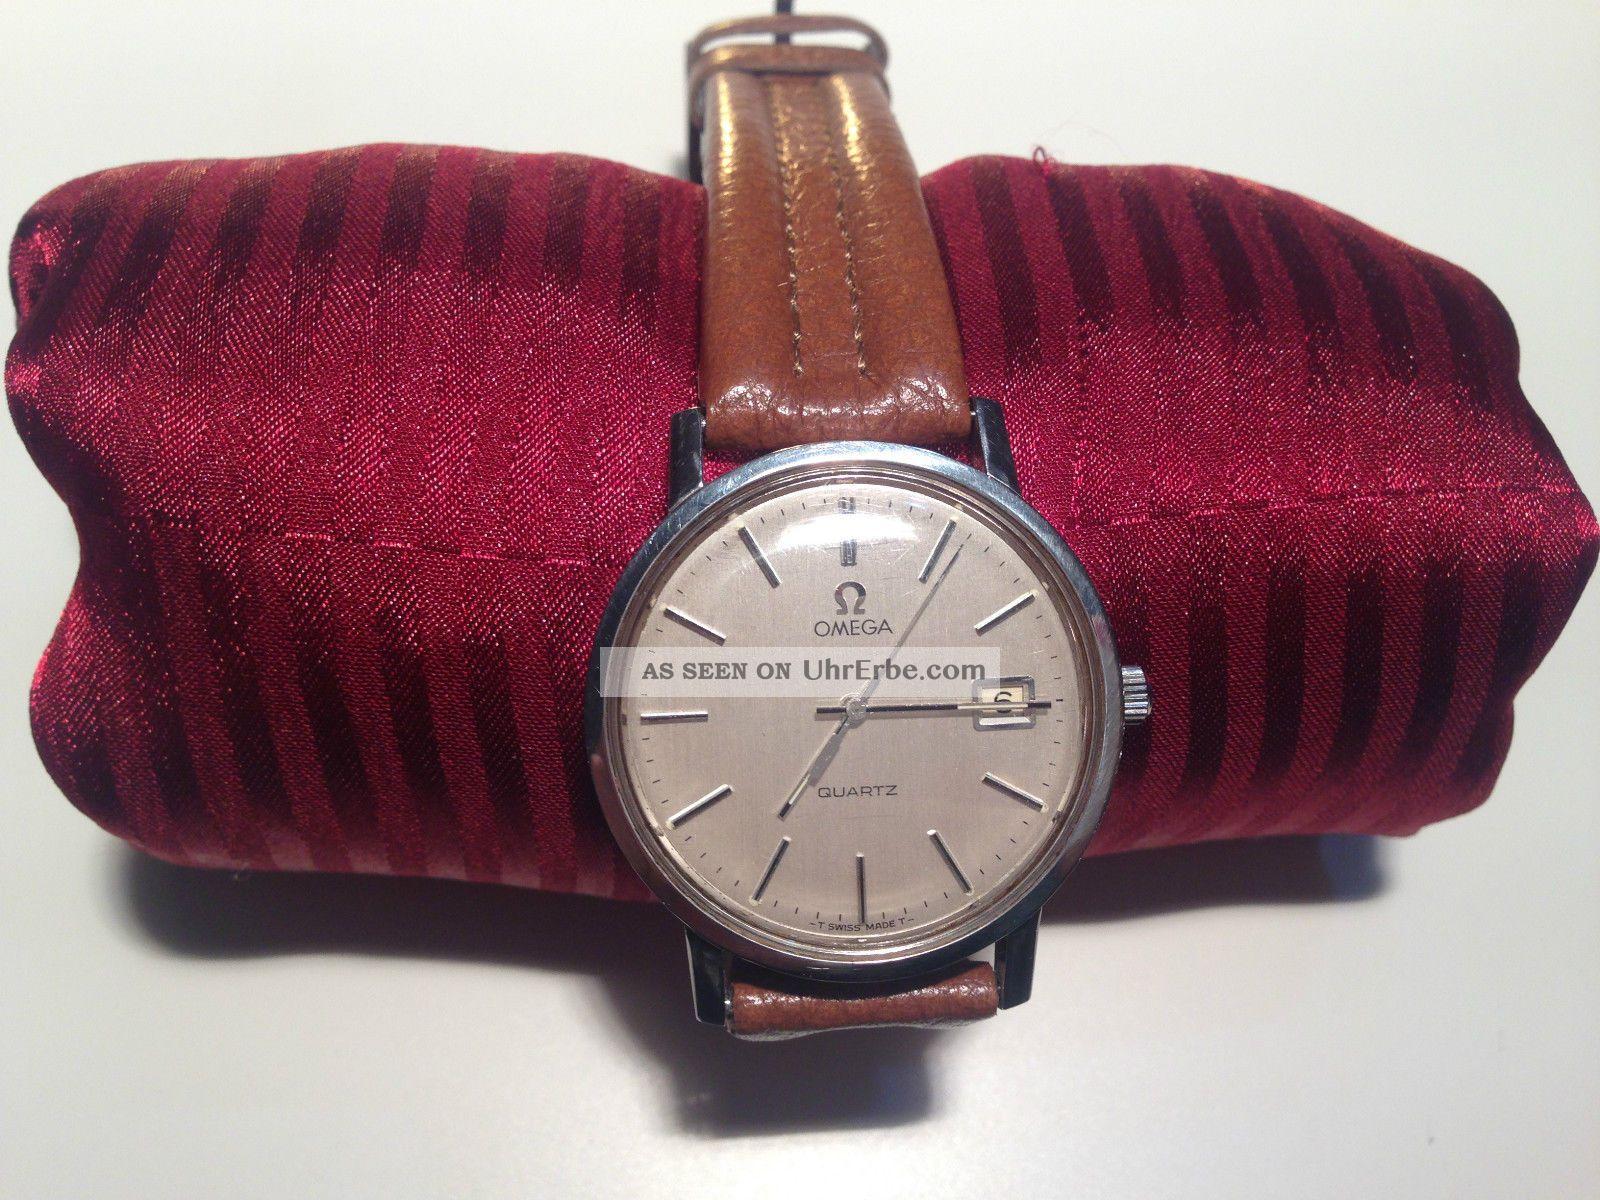 Omega Herren Armband Uhr,  Top,  Cal:1342 Armbanduhren Bild